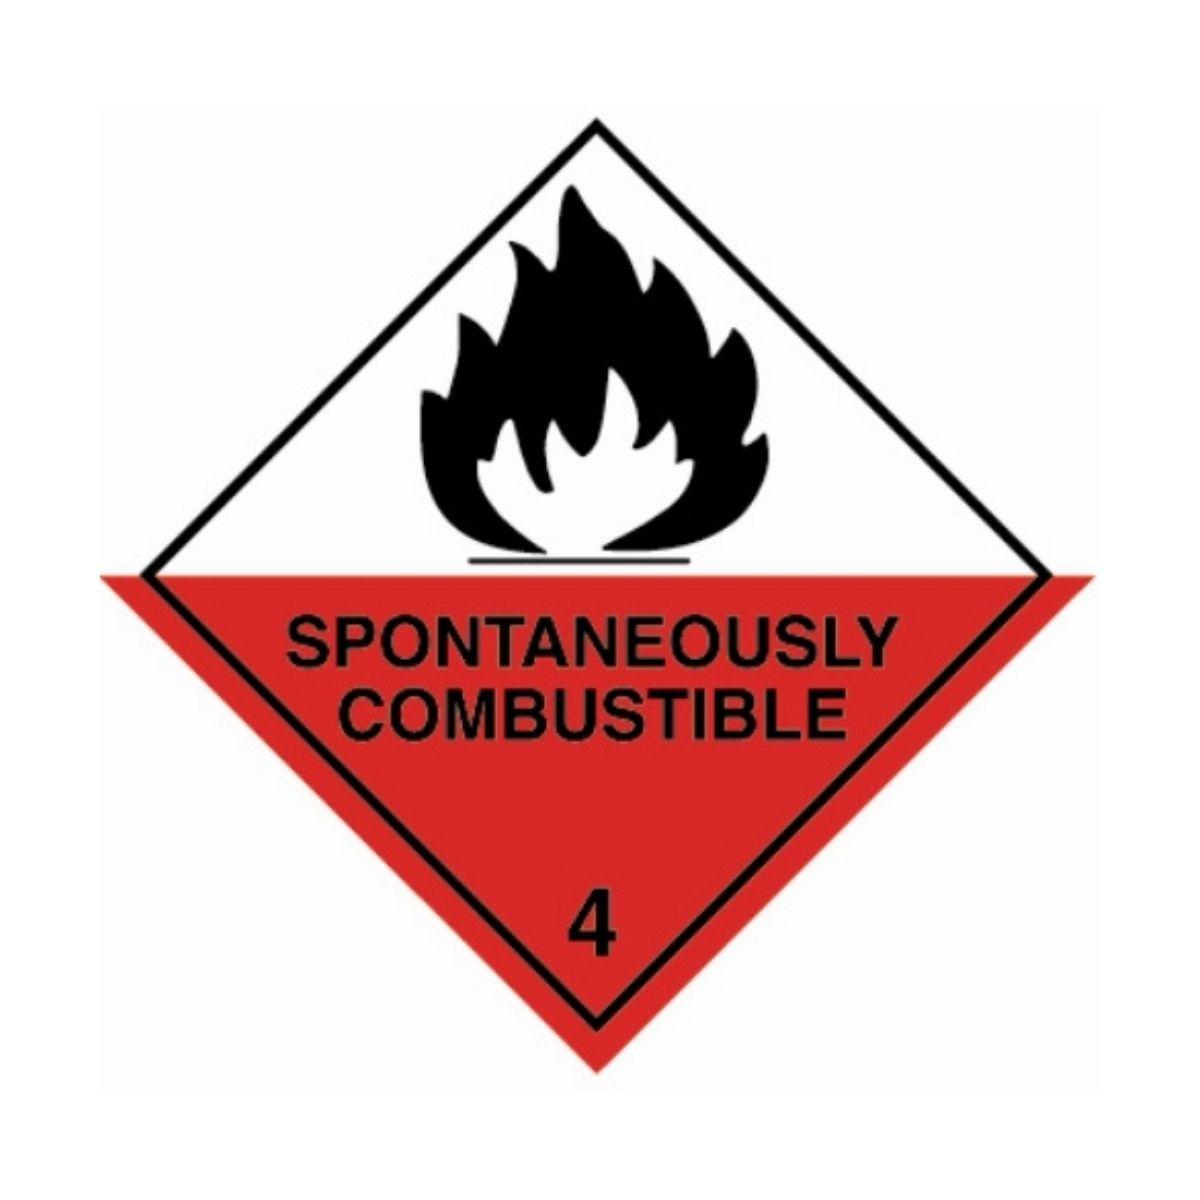 HD1410 UN Hazard Warning Diamond Class 4.2 Spontaneously Combustible